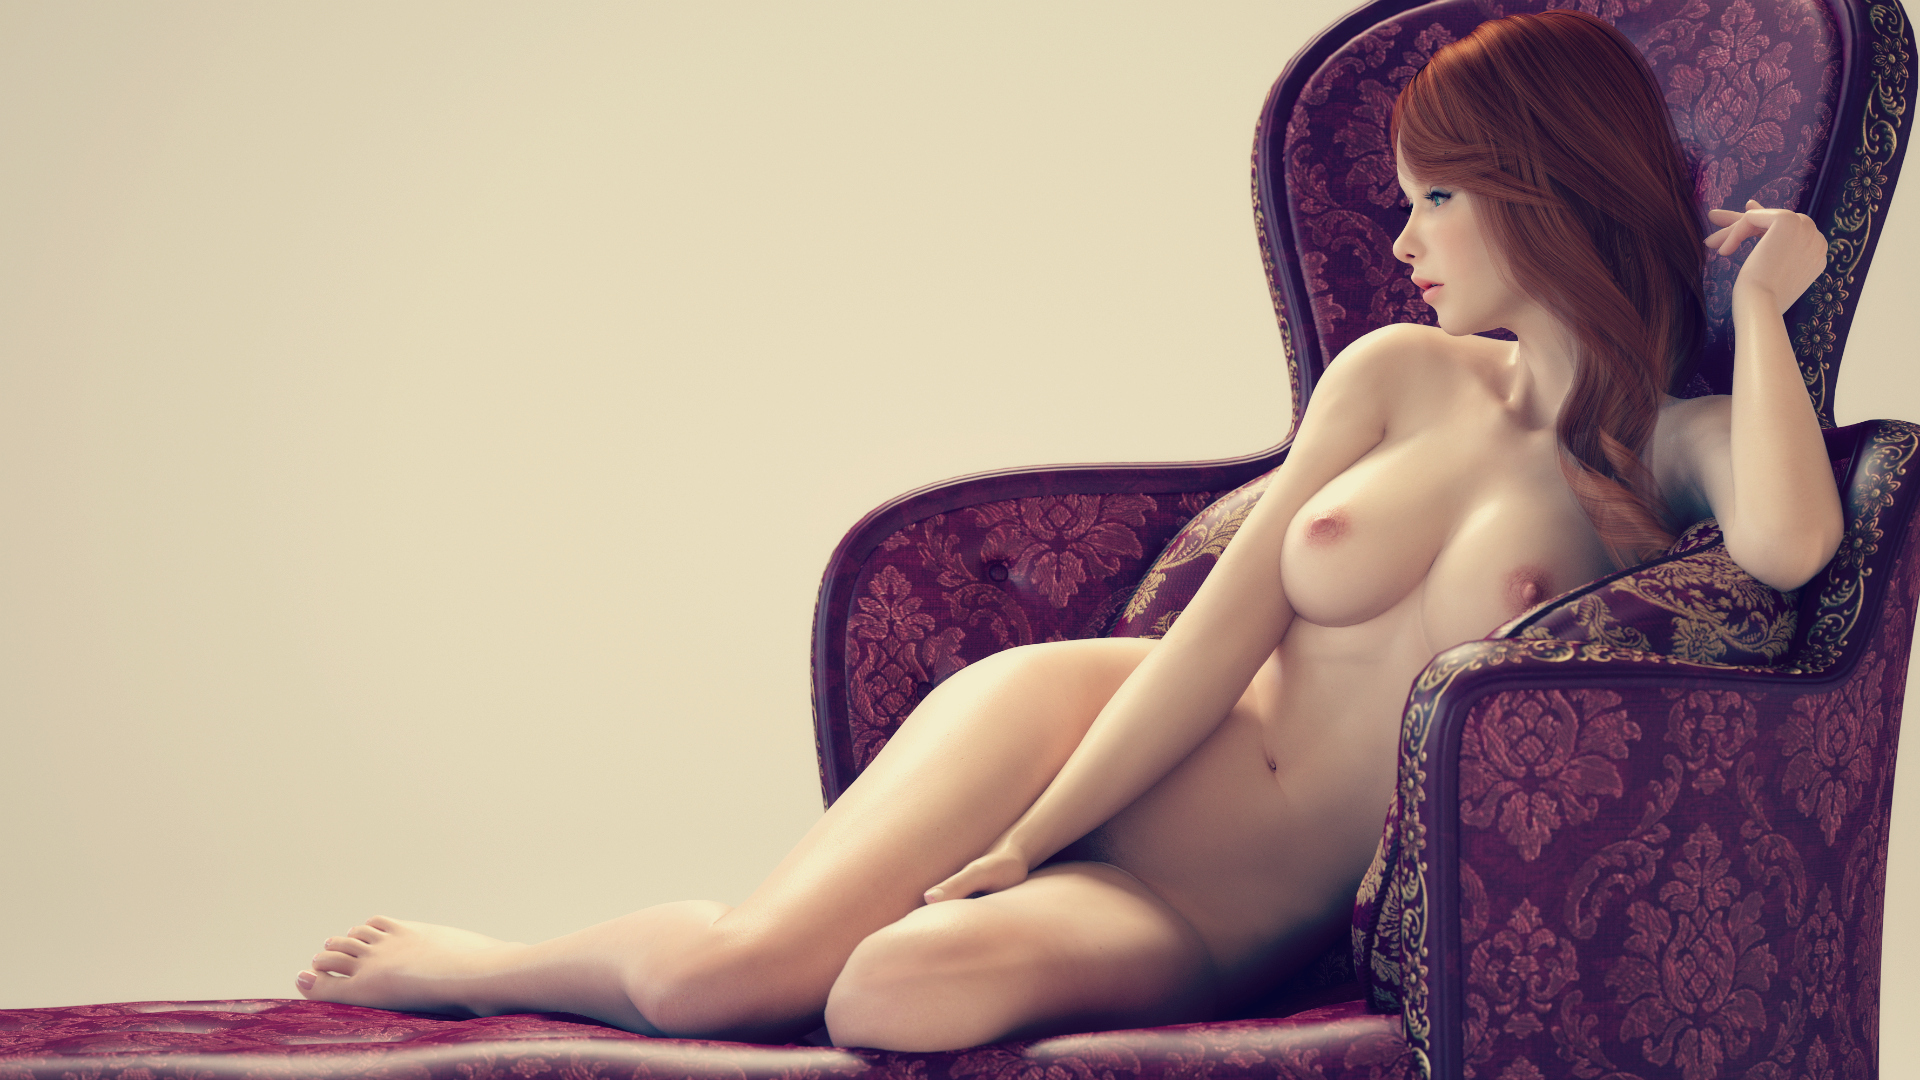 Amazing 3D Porn Art pron hd 3d art girl wallpaper nude scenes